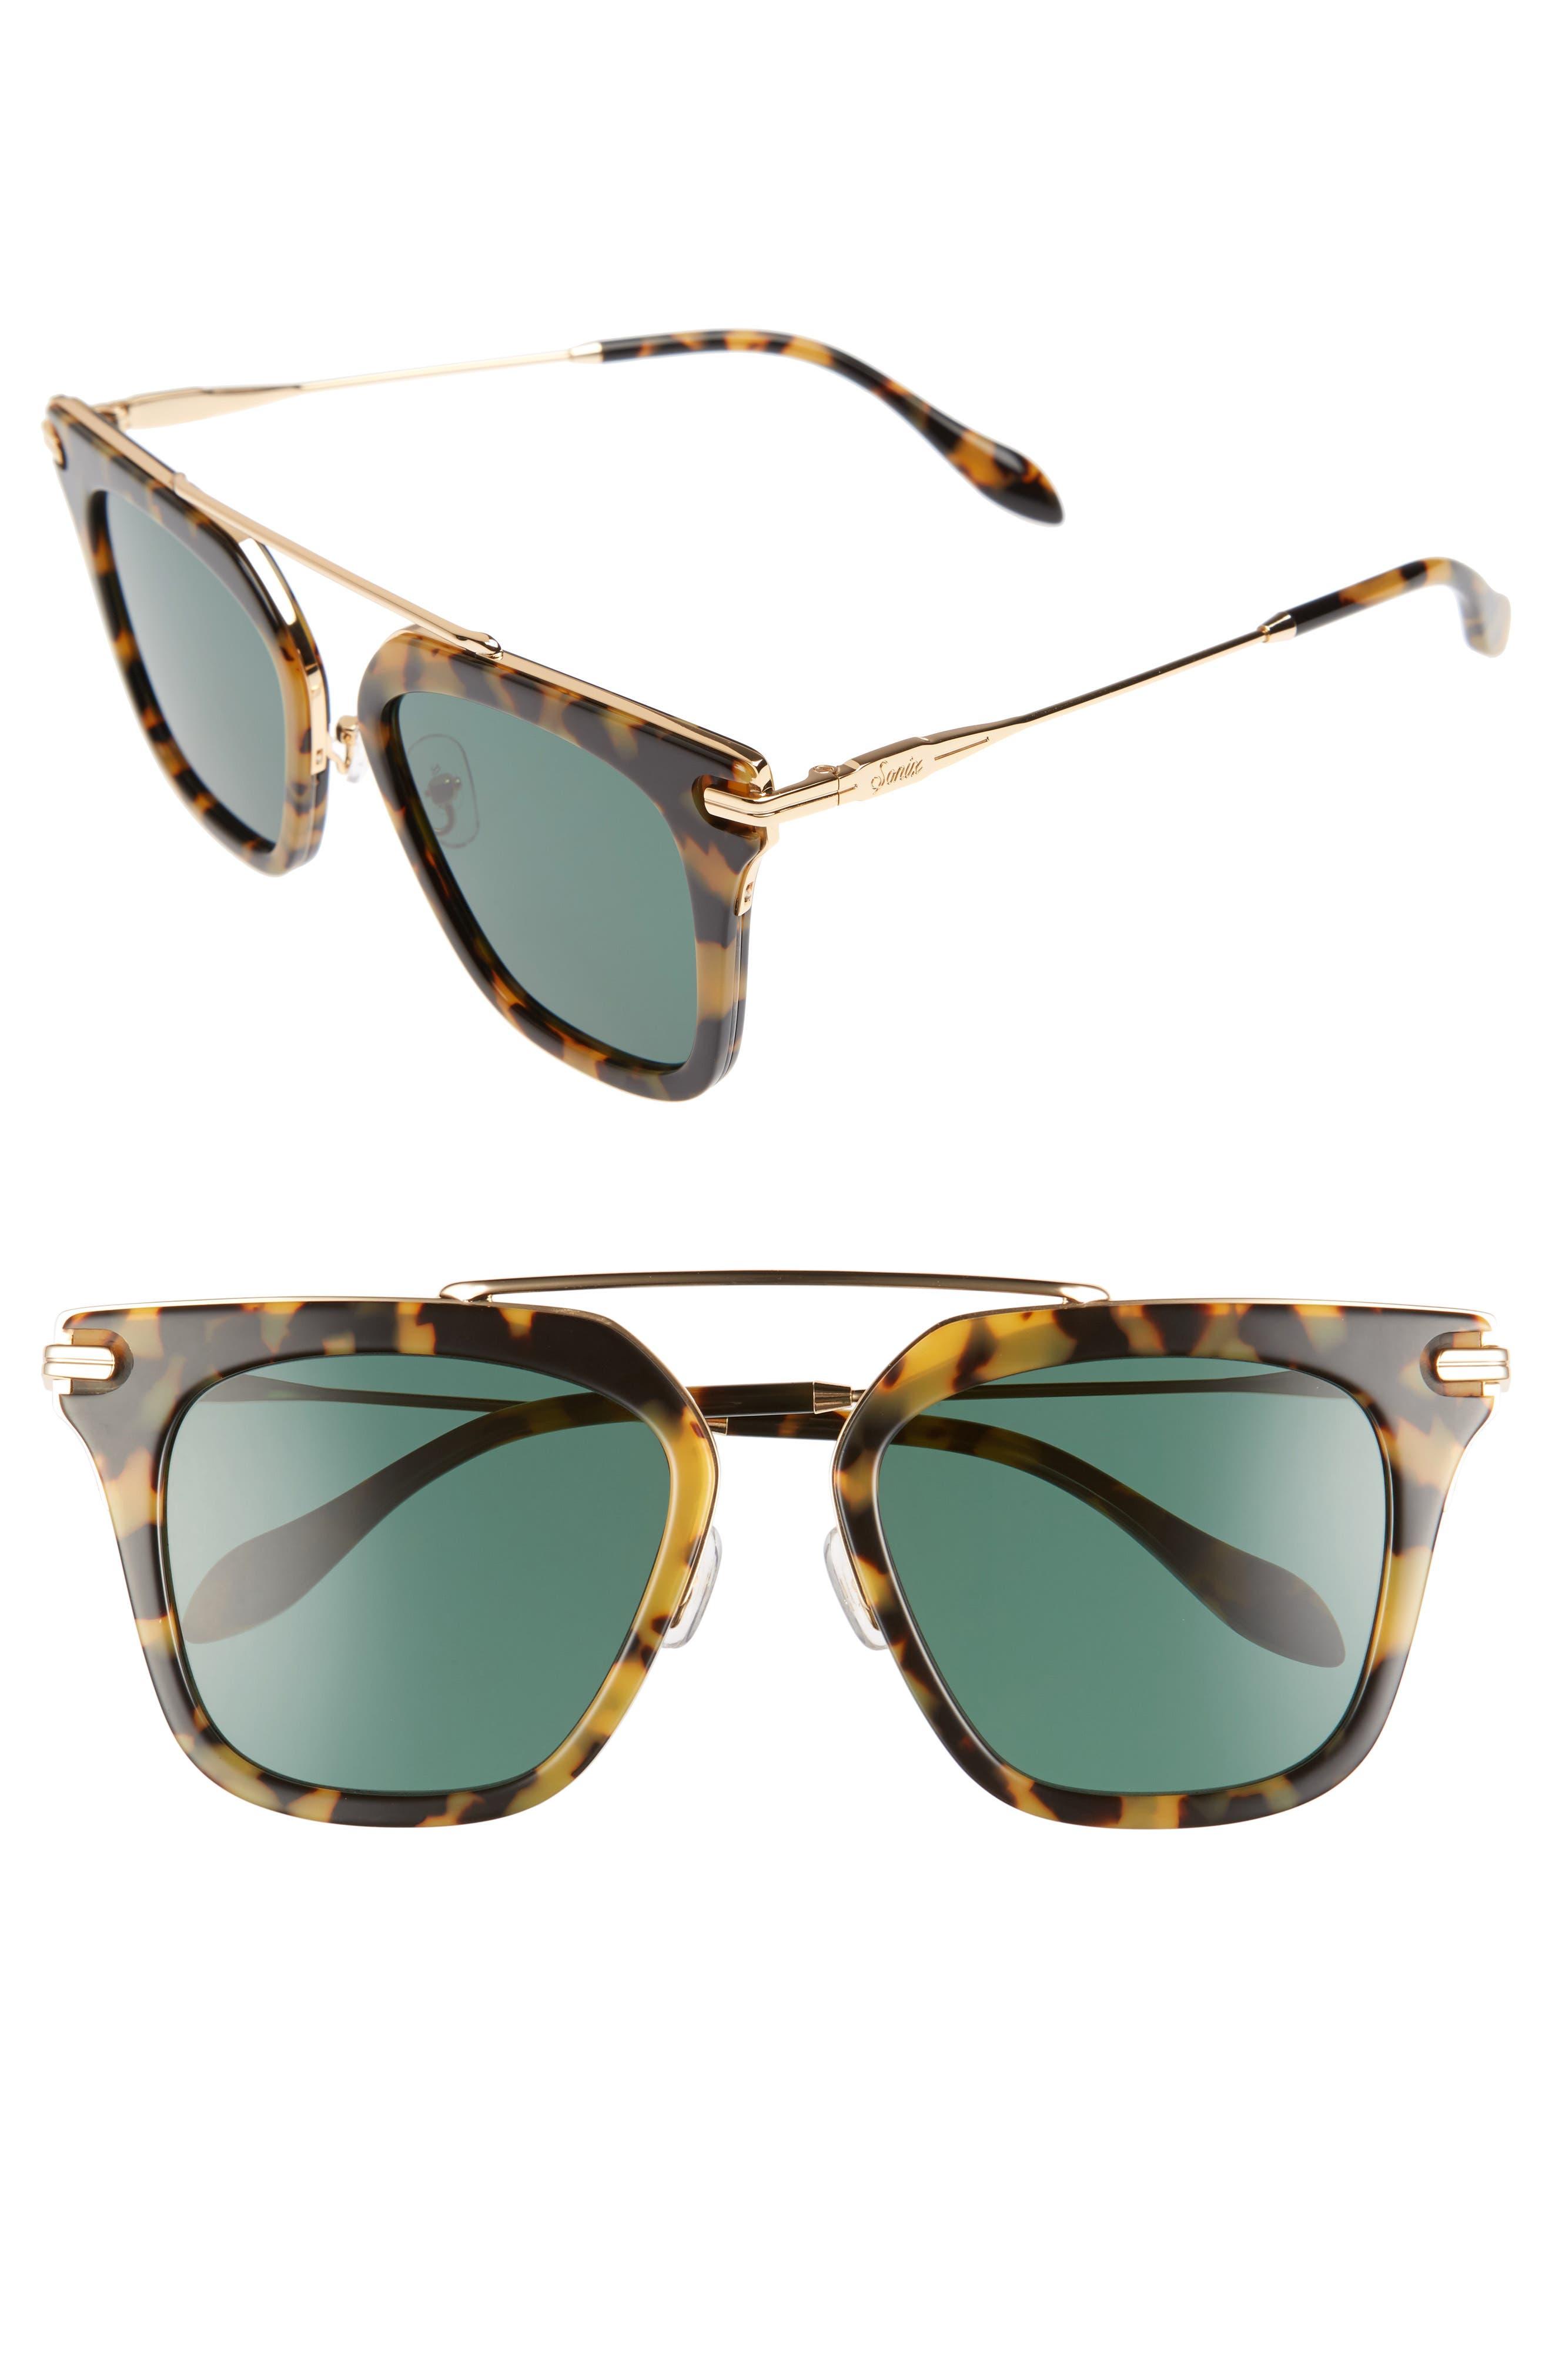 Parker 50mm Sunglasses,                         Main,                         color, Caramel Tortoise/ Green Solid